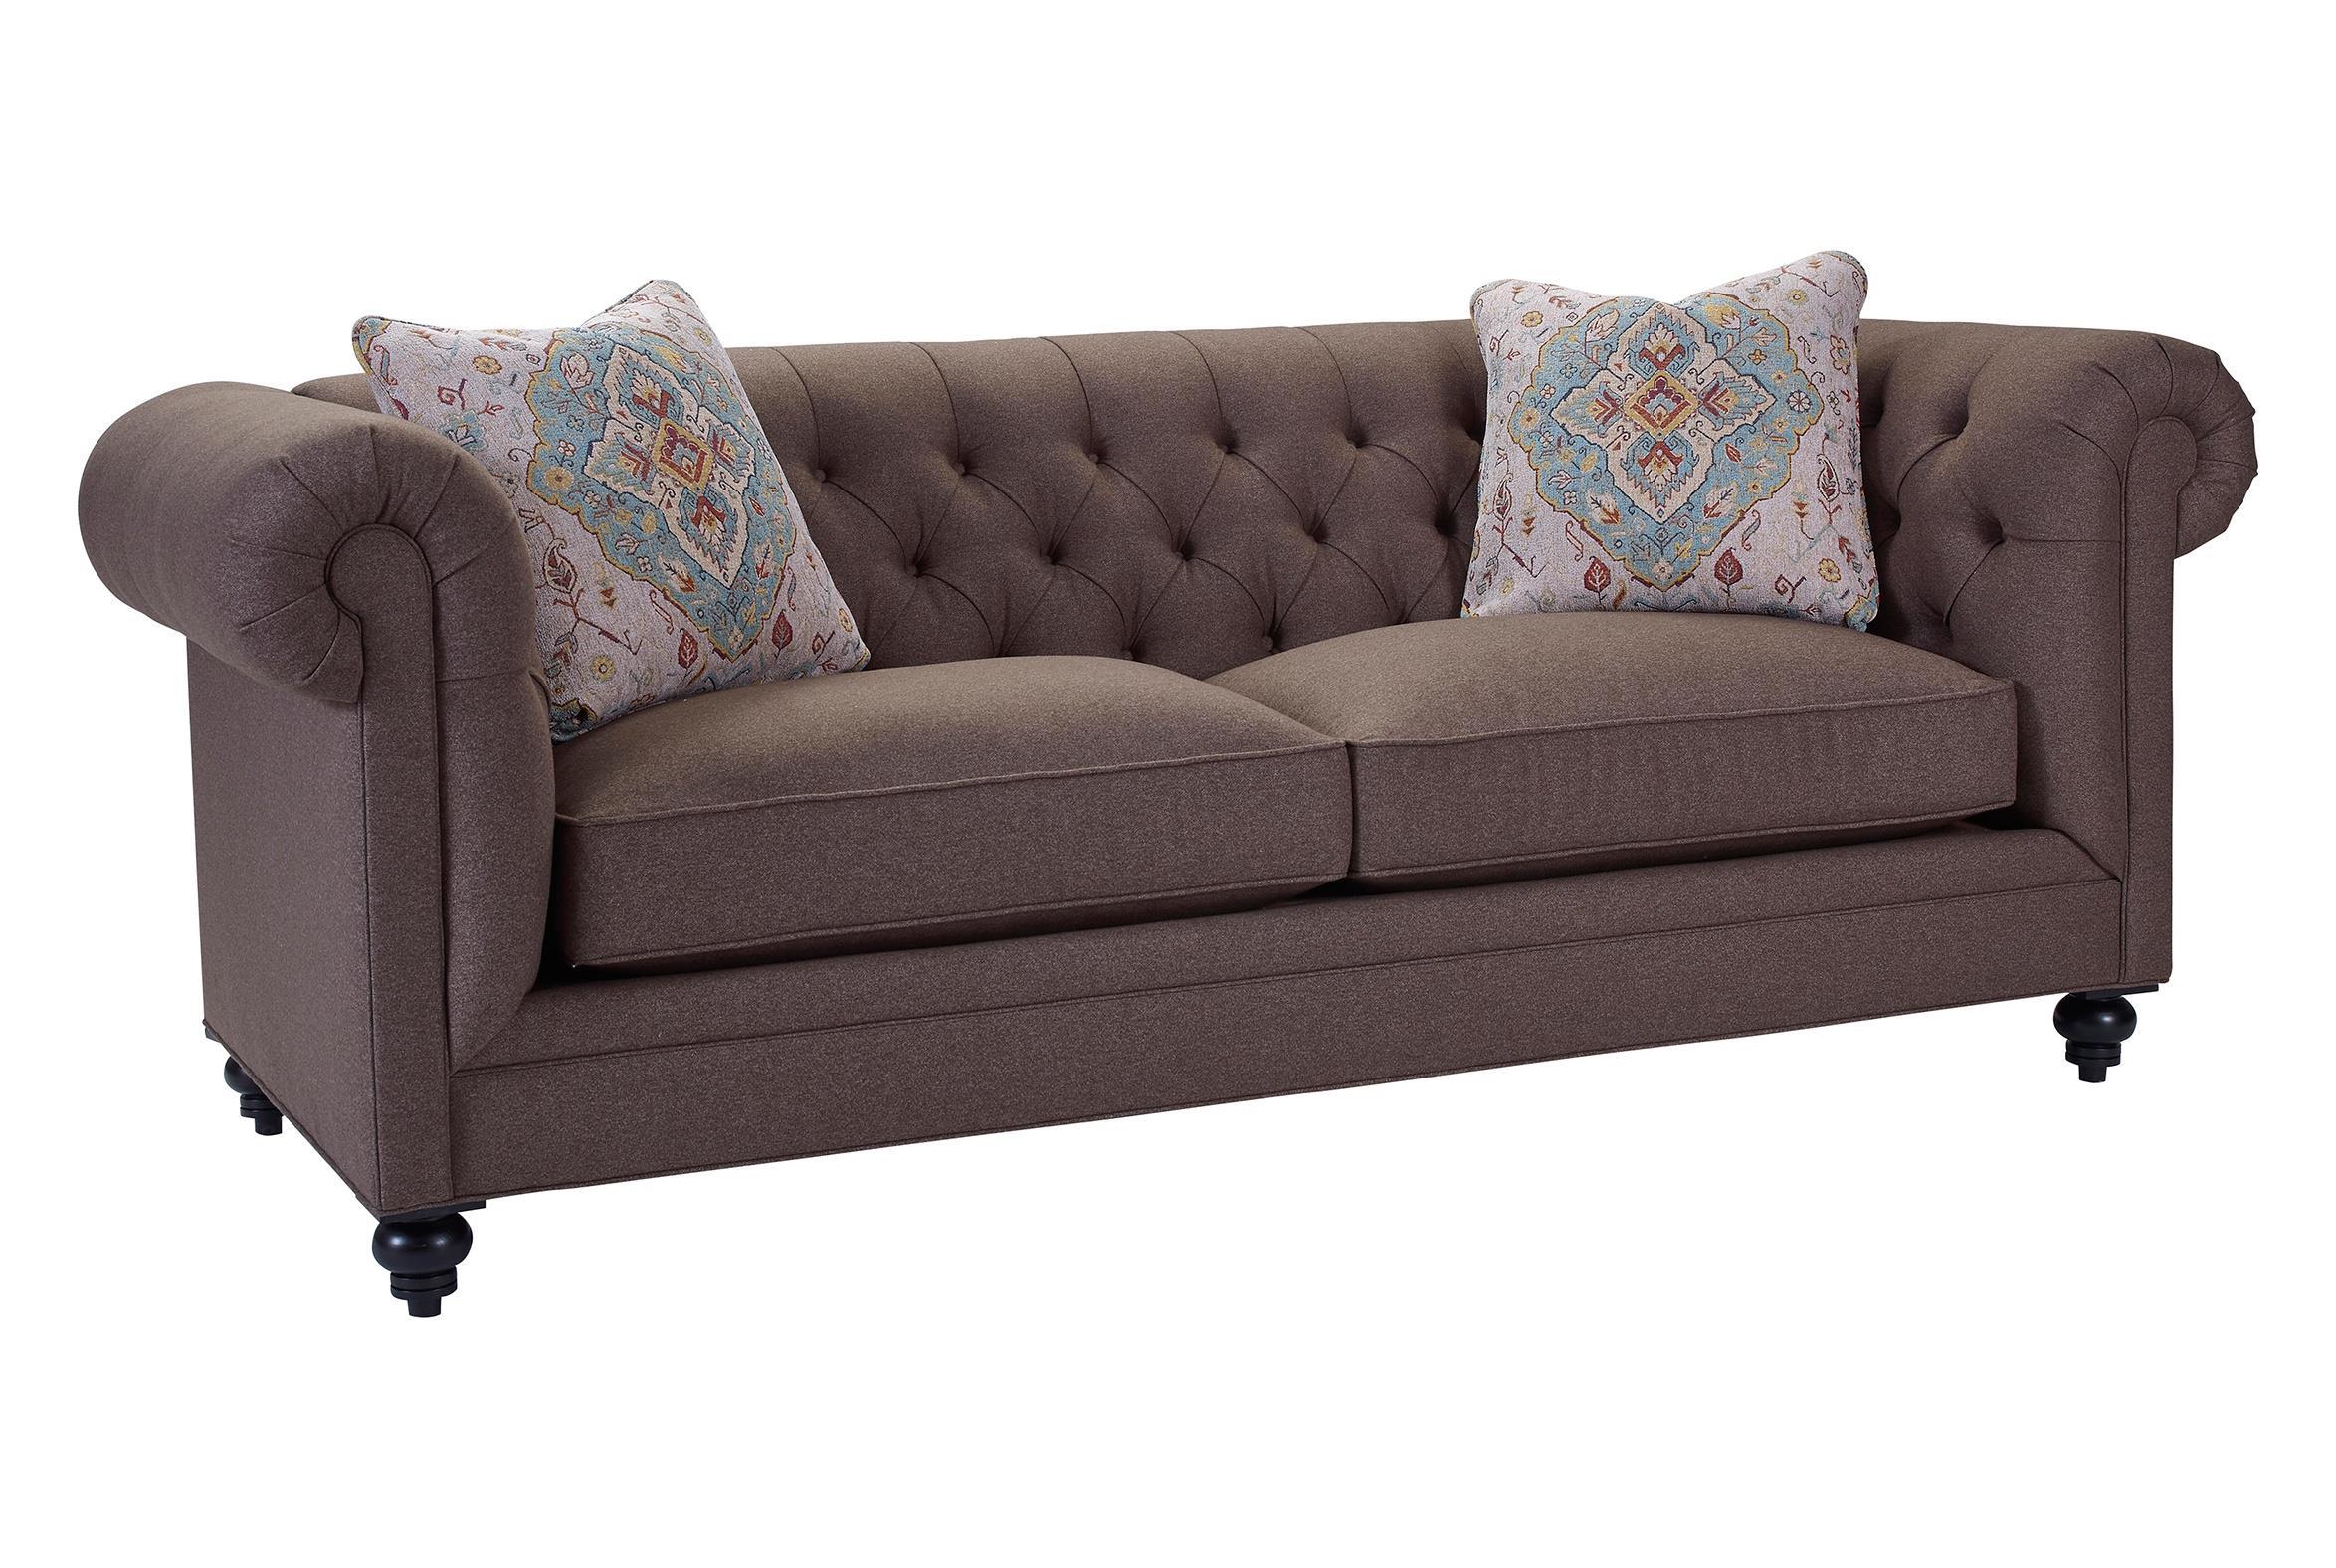 Broyhill Furniture Heath Sofa - Item Number: 4268-3-4612-87